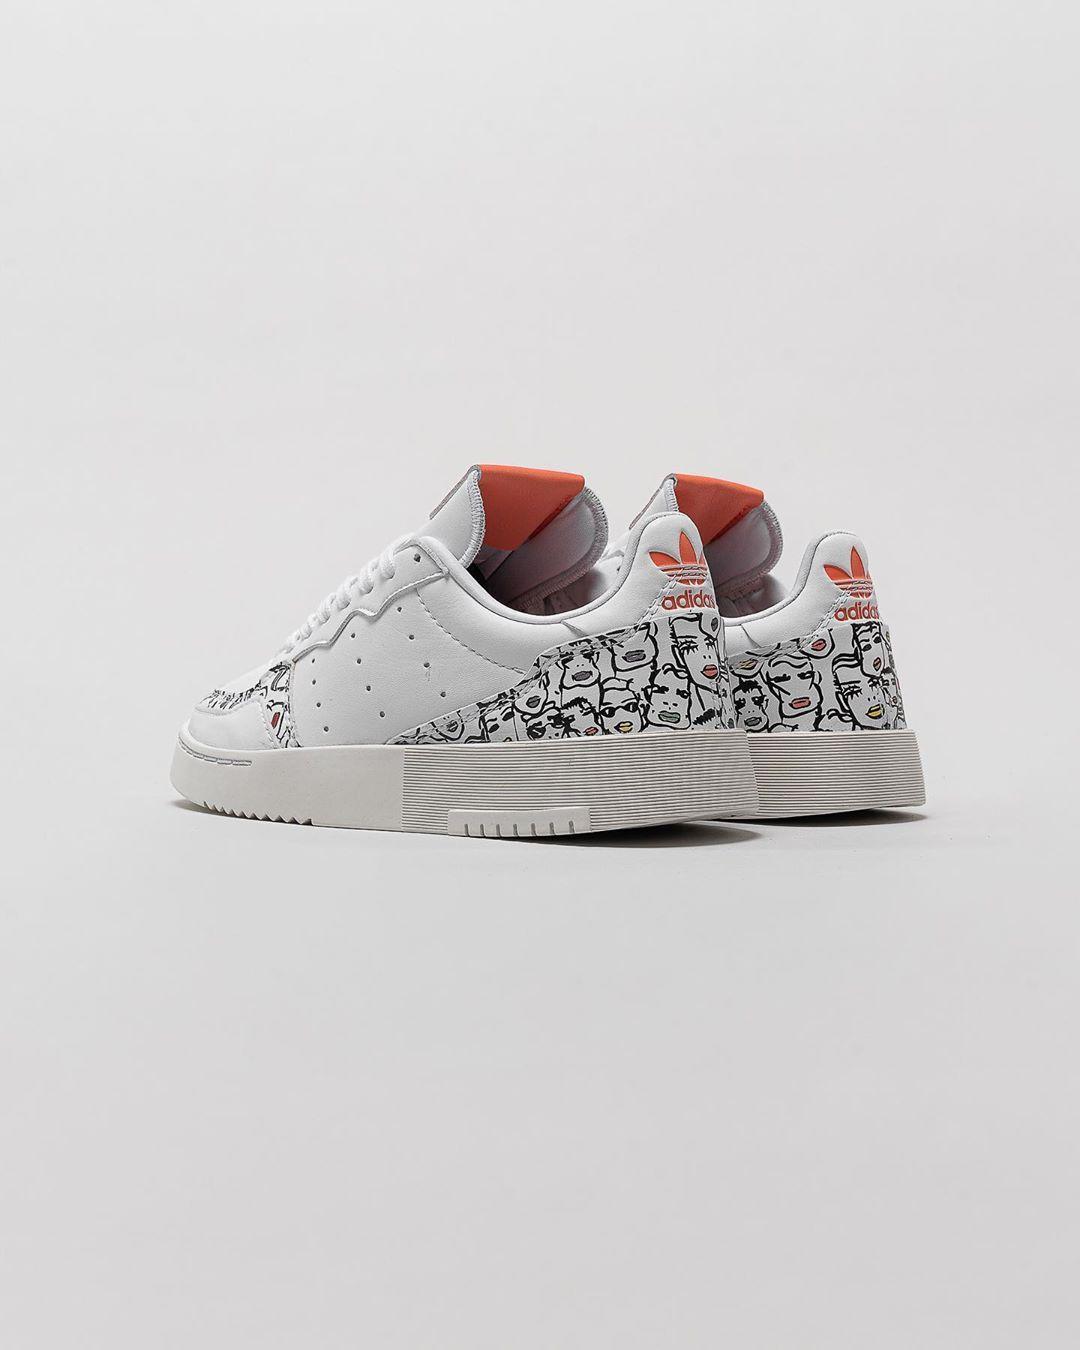 adidas Originals x Fiorucci Supercourt Sneaker in bunt